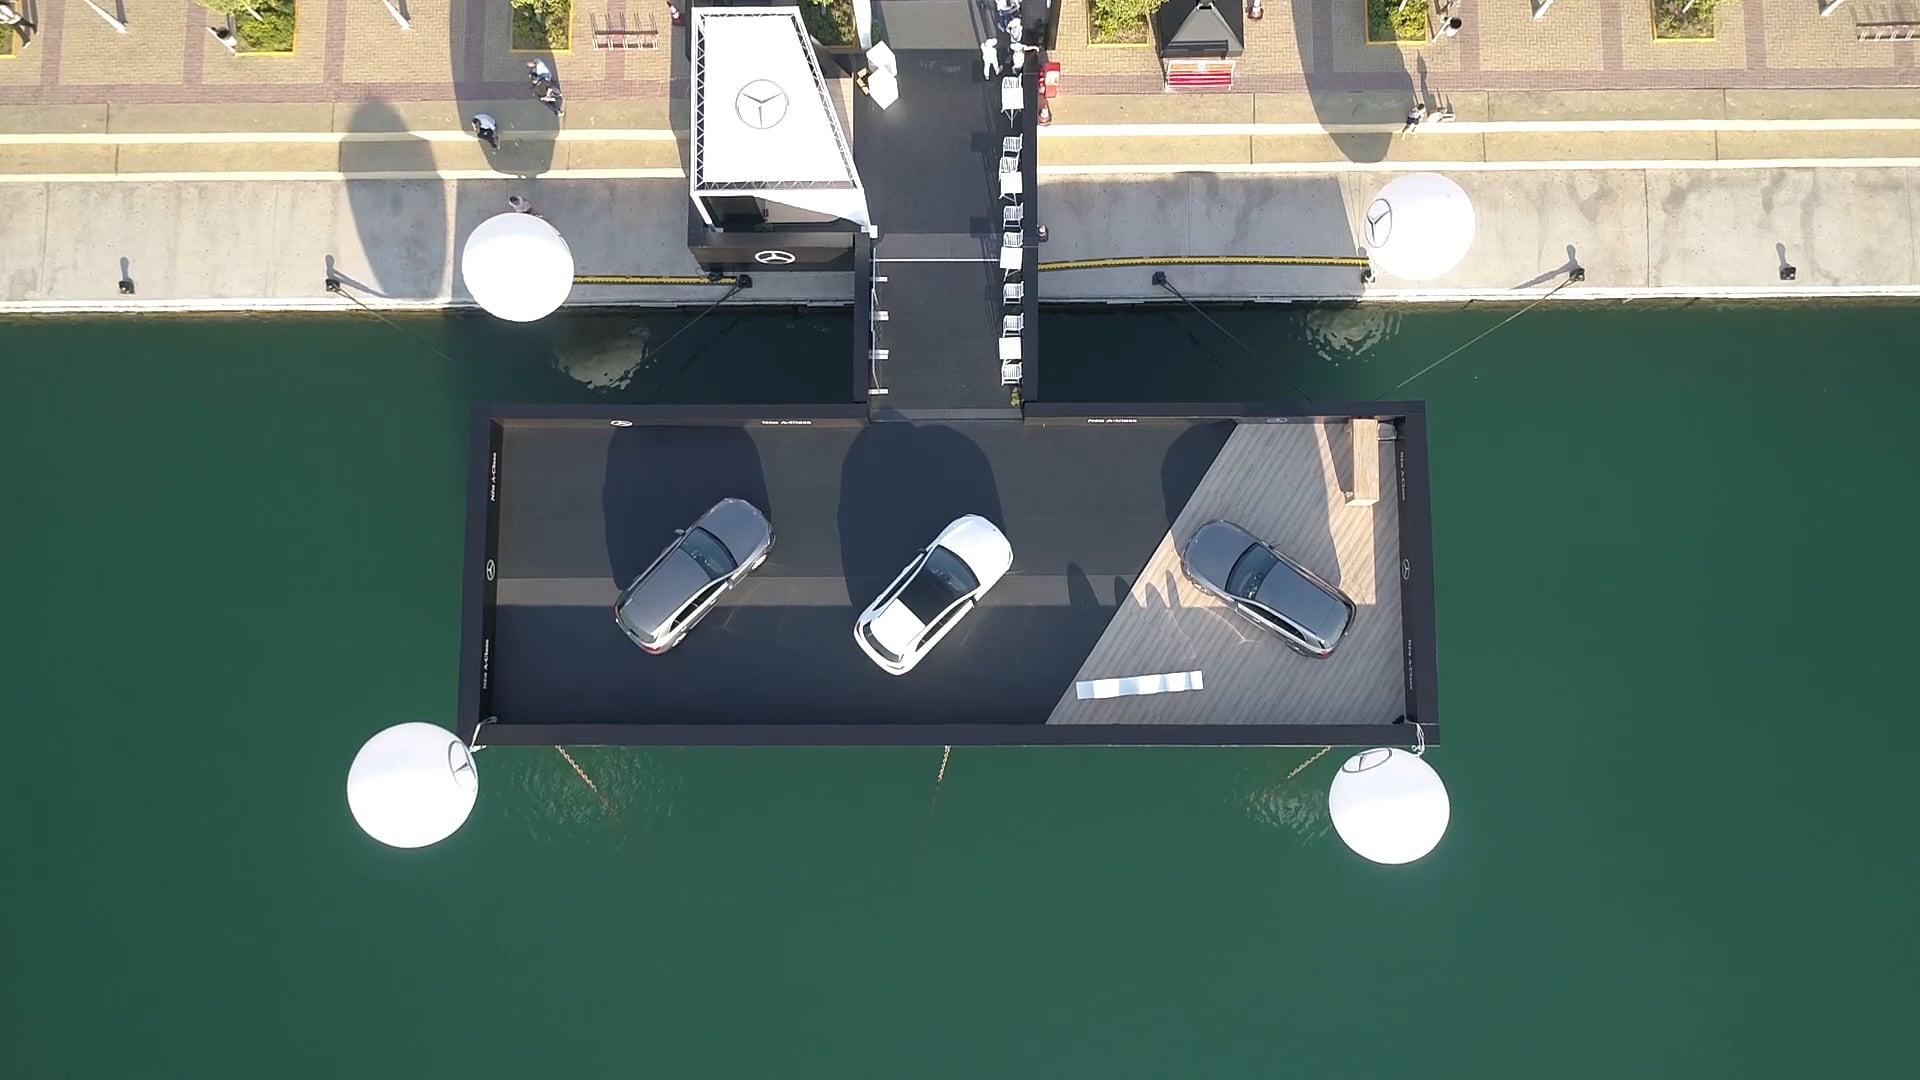 Presentación Making-of | Mercedes-Benz New A-Class Launch @Flisvos Marina | Magna Events | Grecia